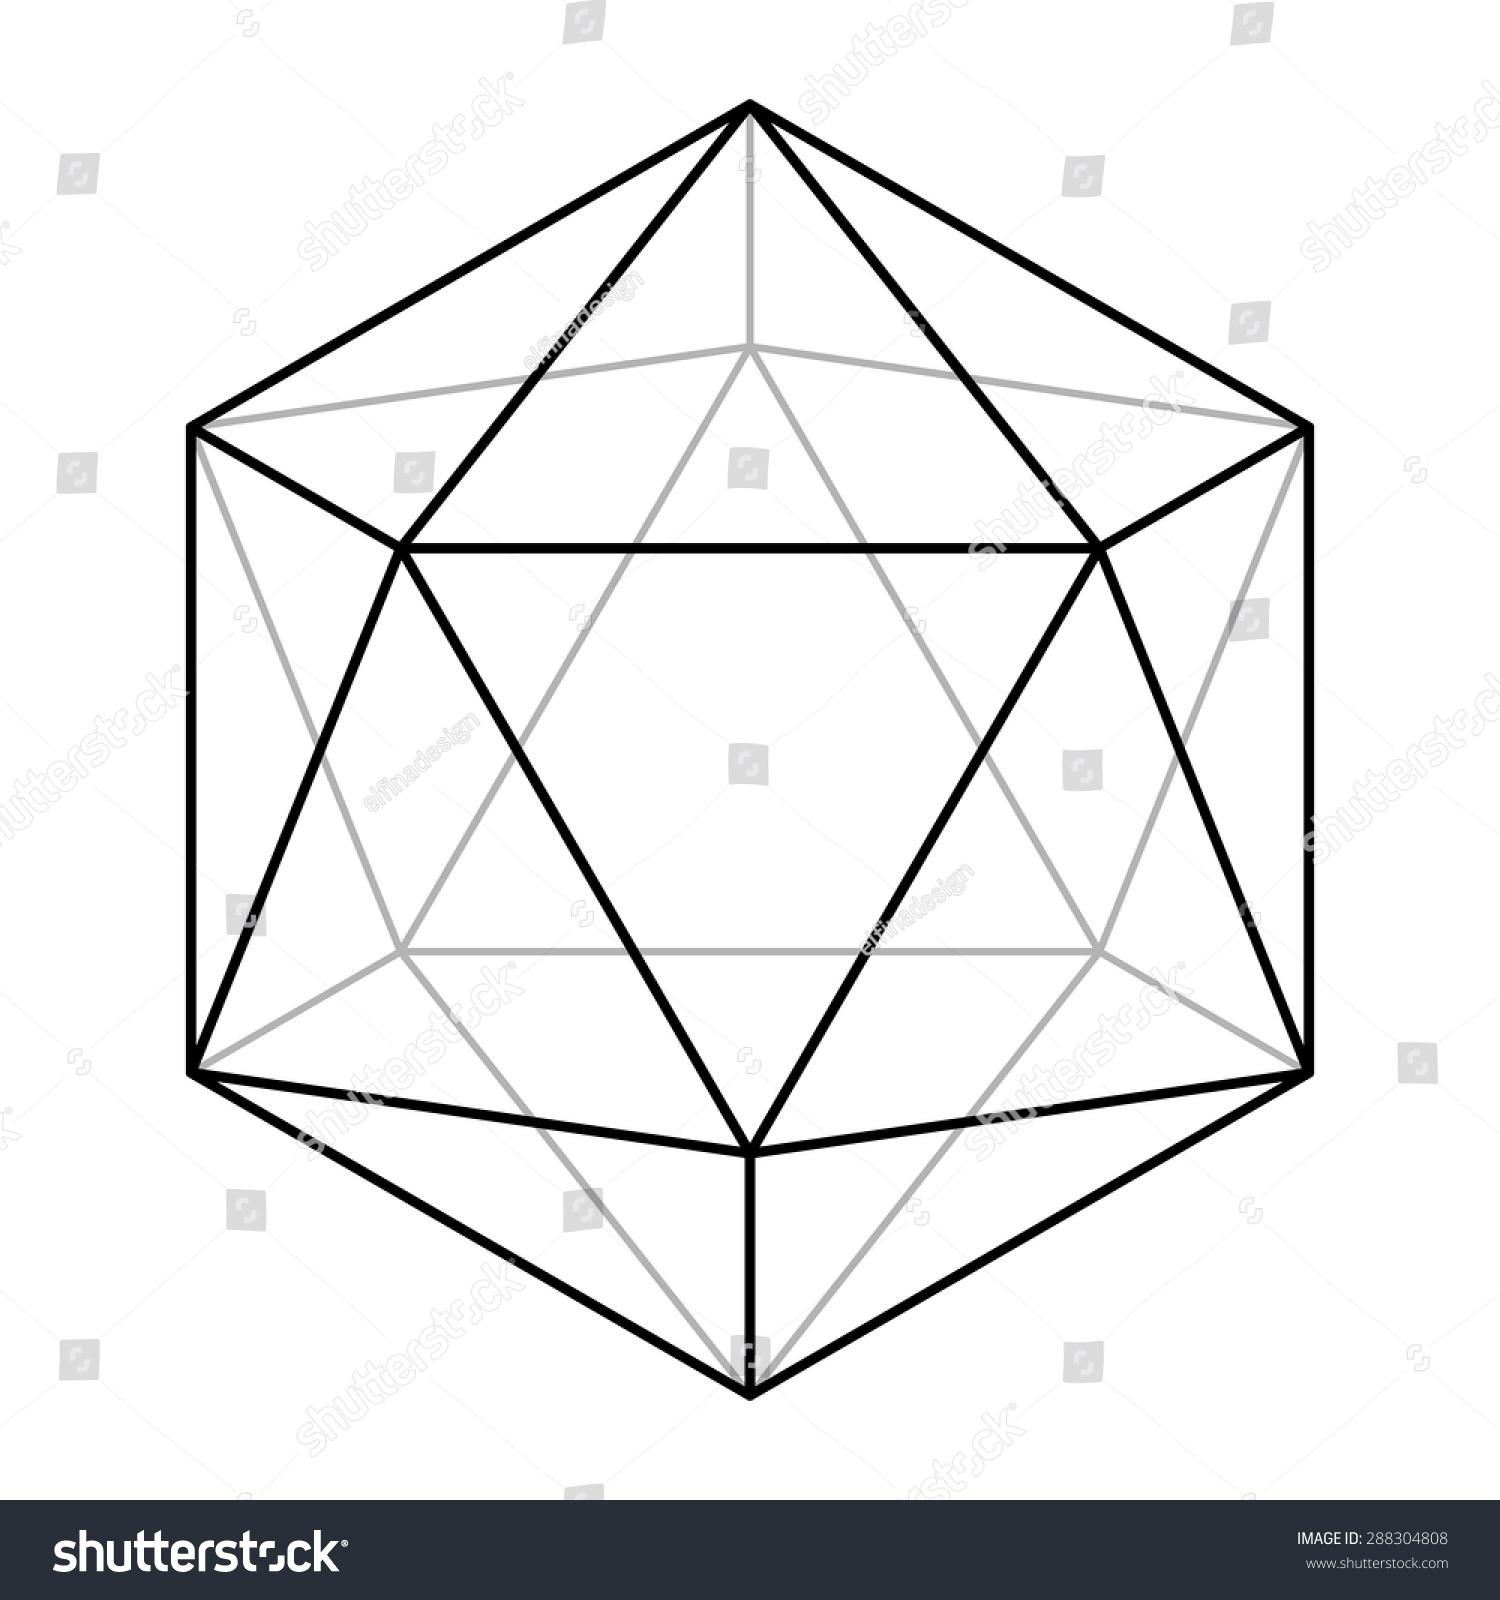 Simple Geometric Line Art : Icosahedron line drawing sacred geometry platonic stock